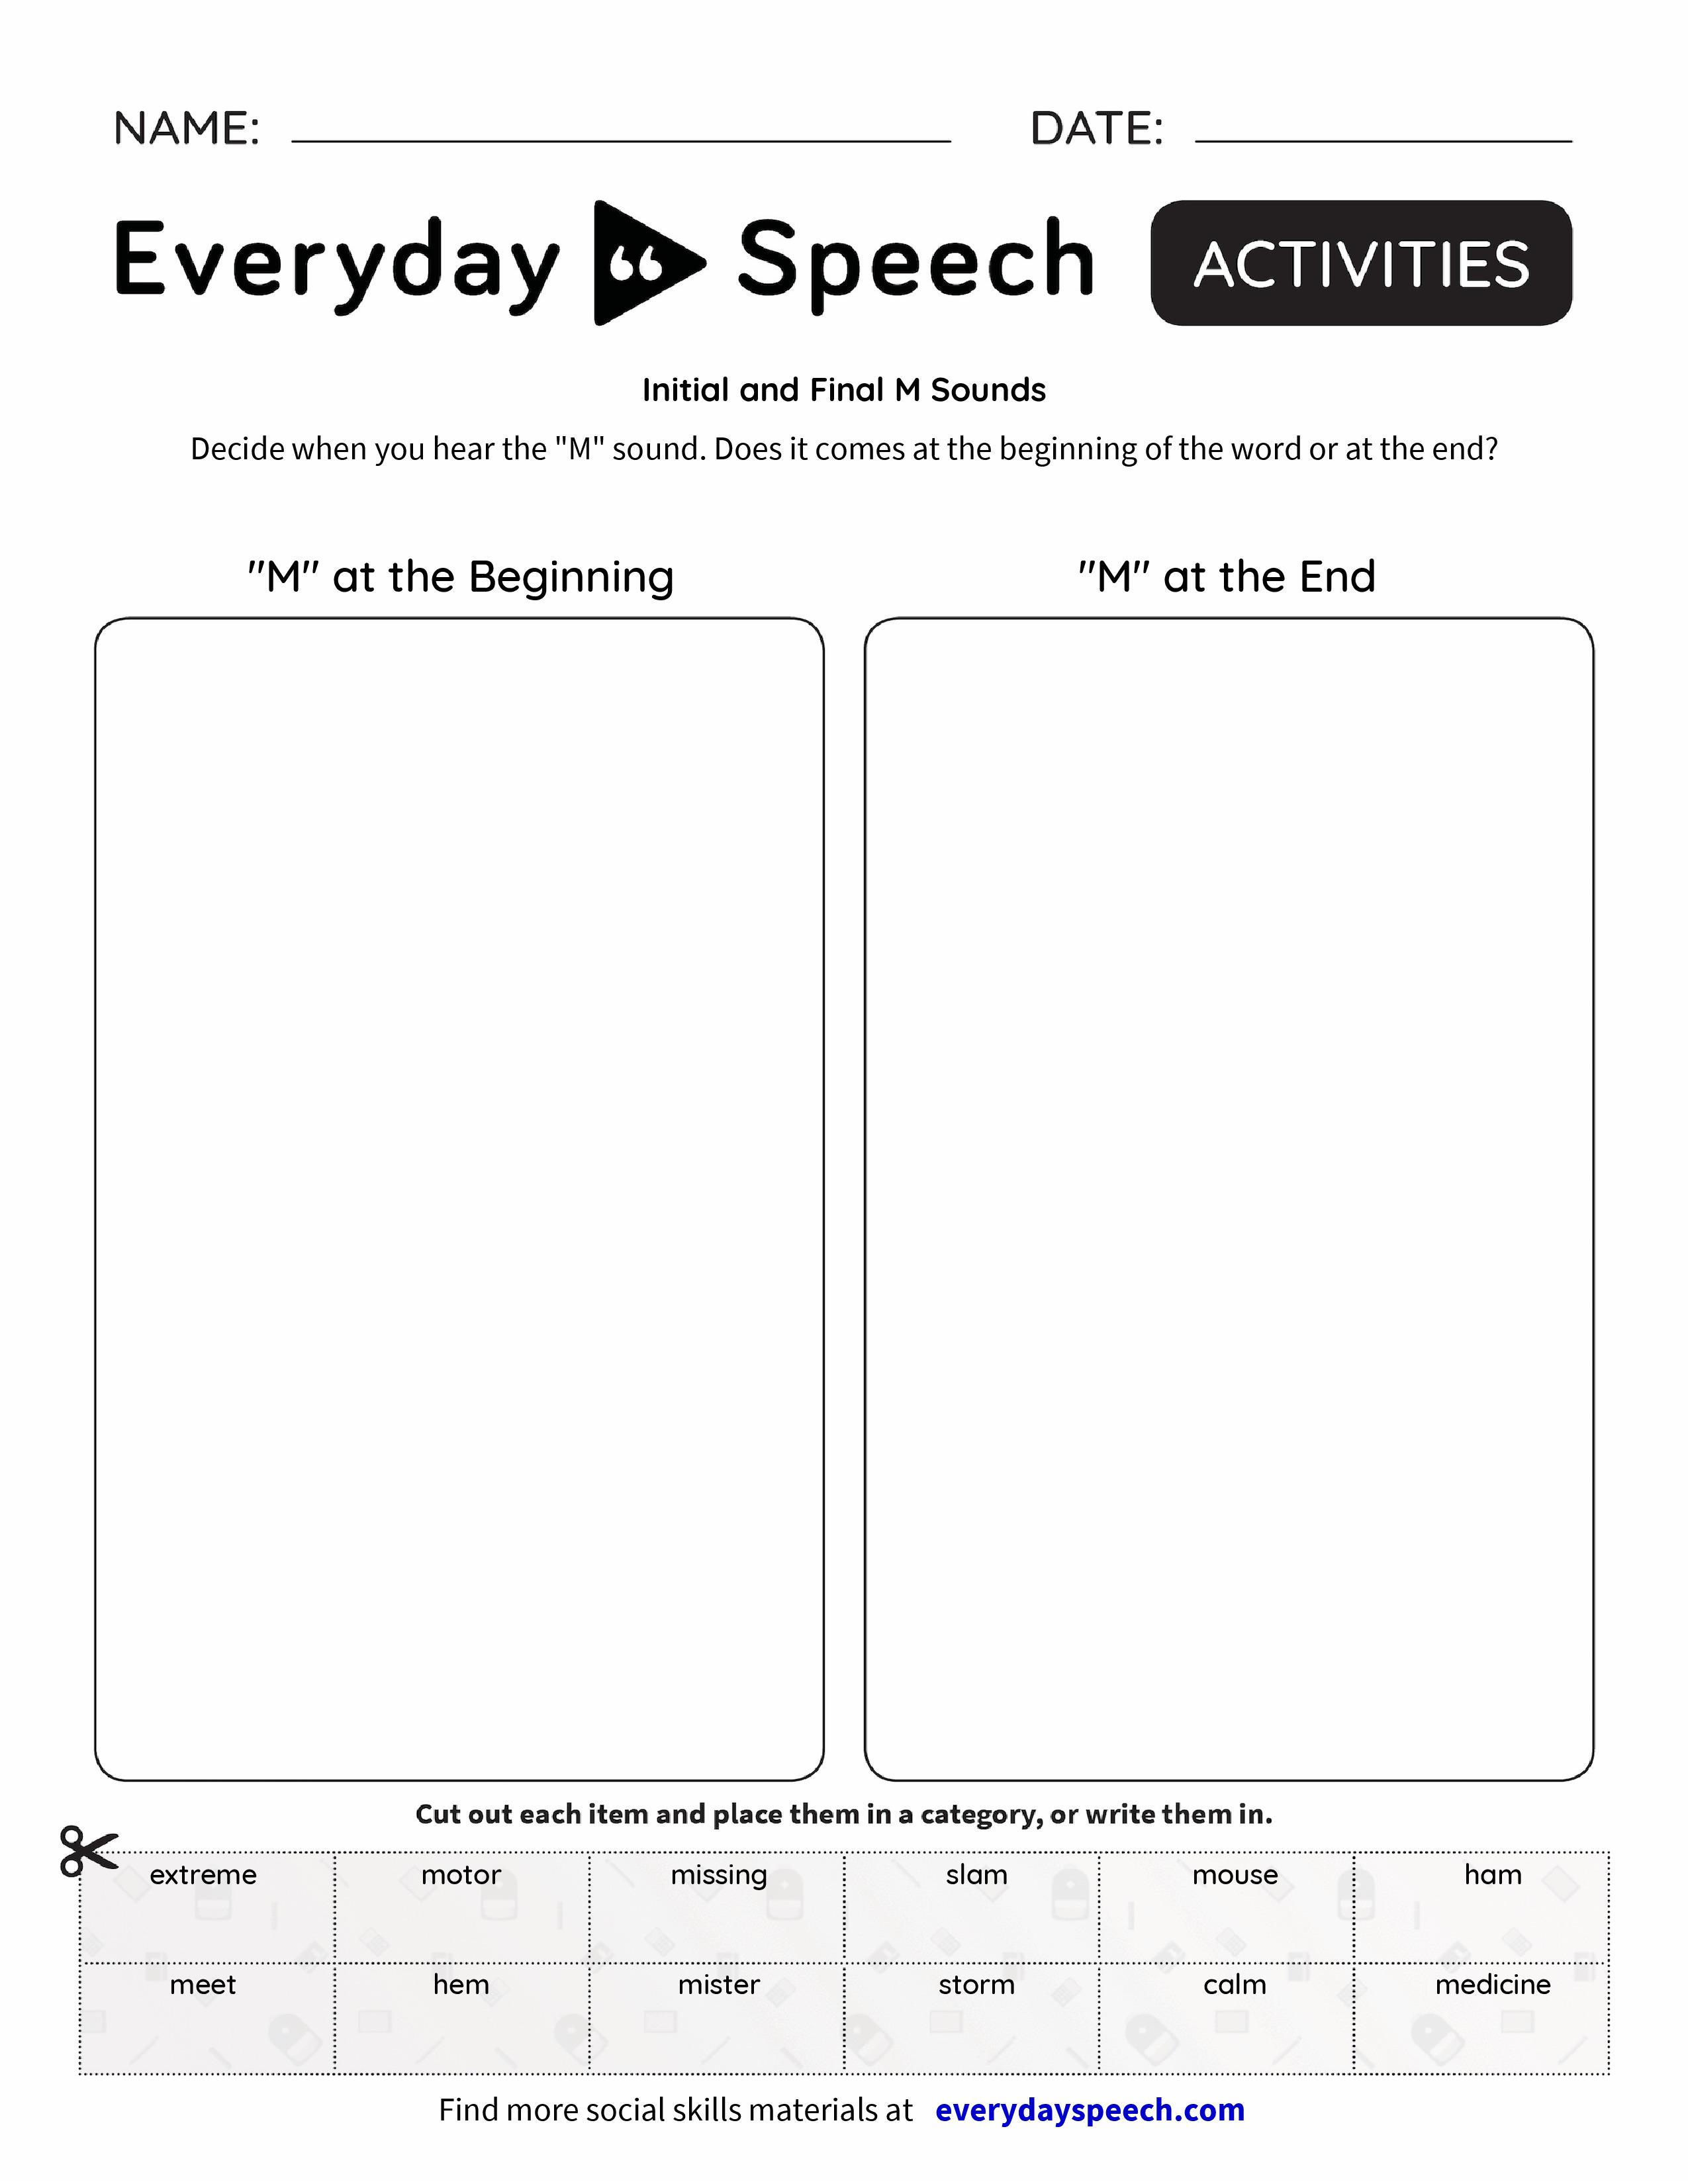 Initial And Final M Sounds Everyday Speech Everyday Speech